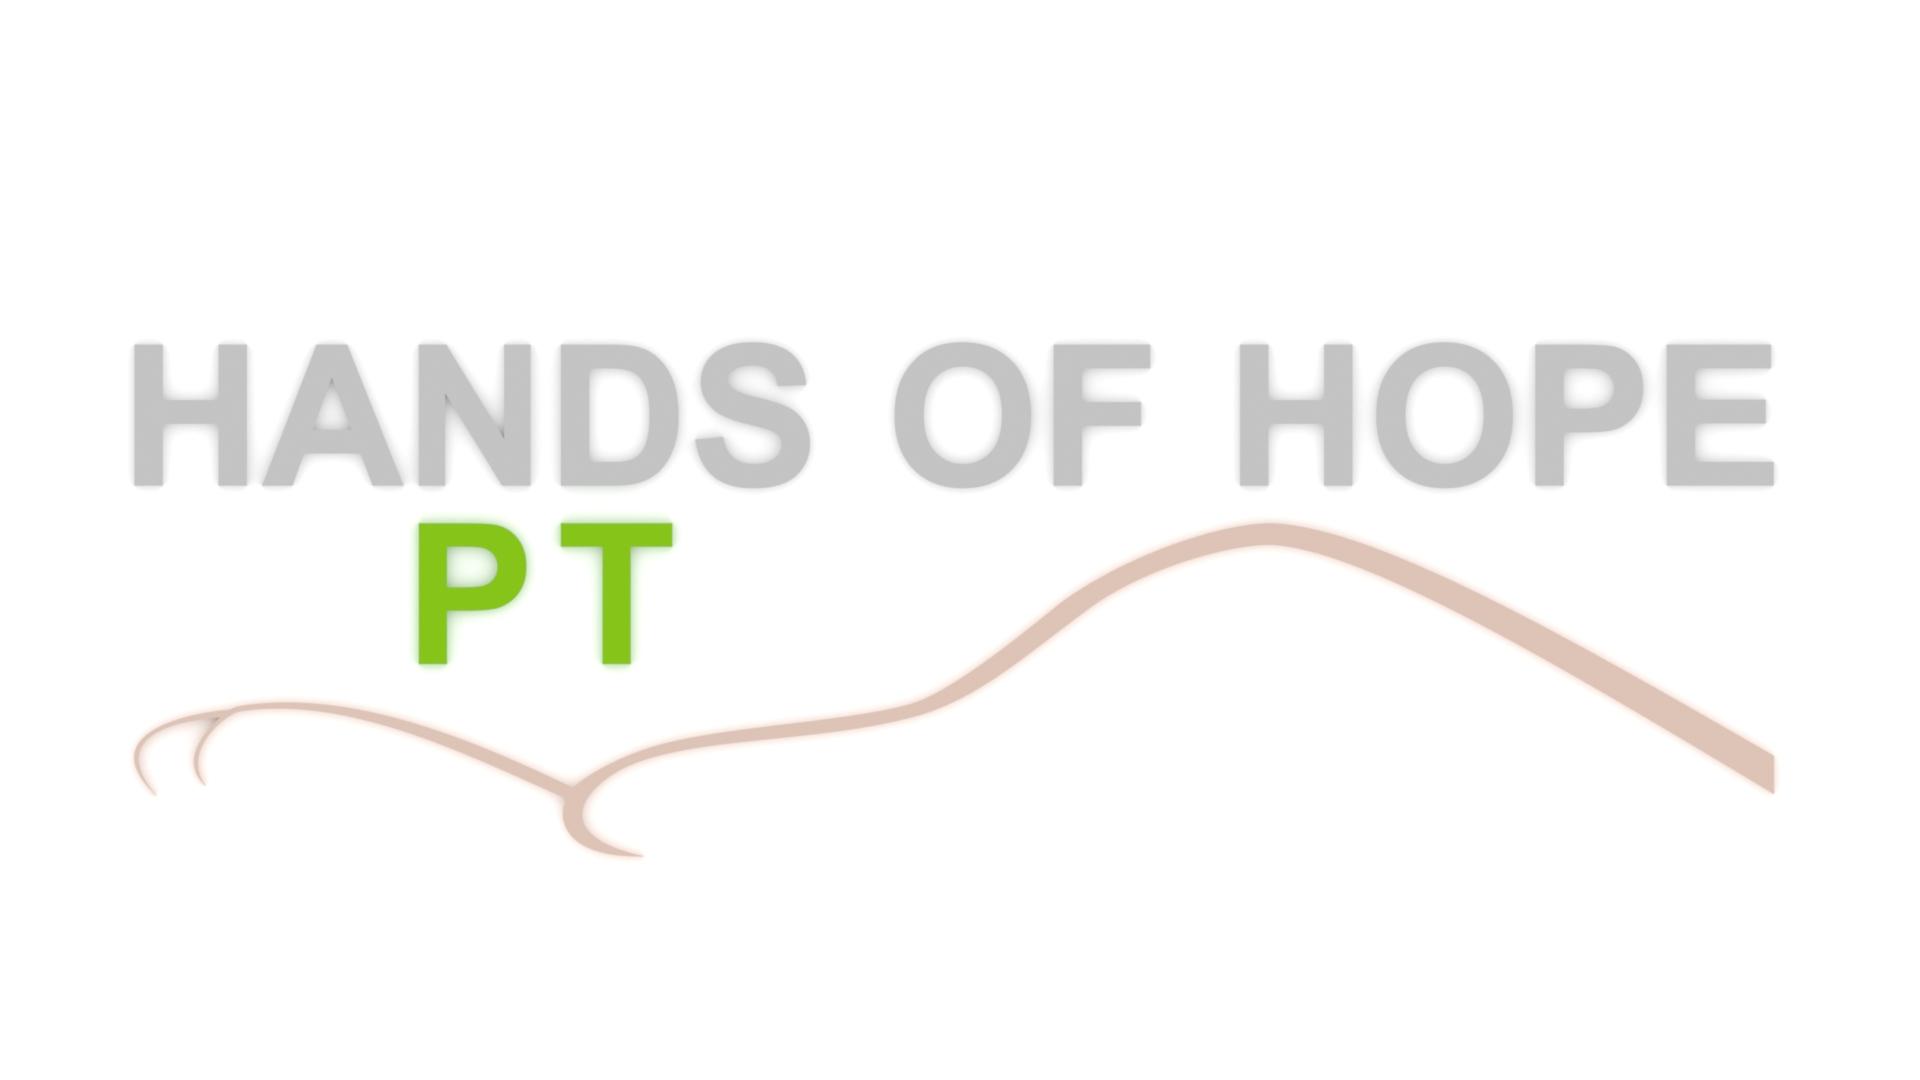 Hands of Hope PT